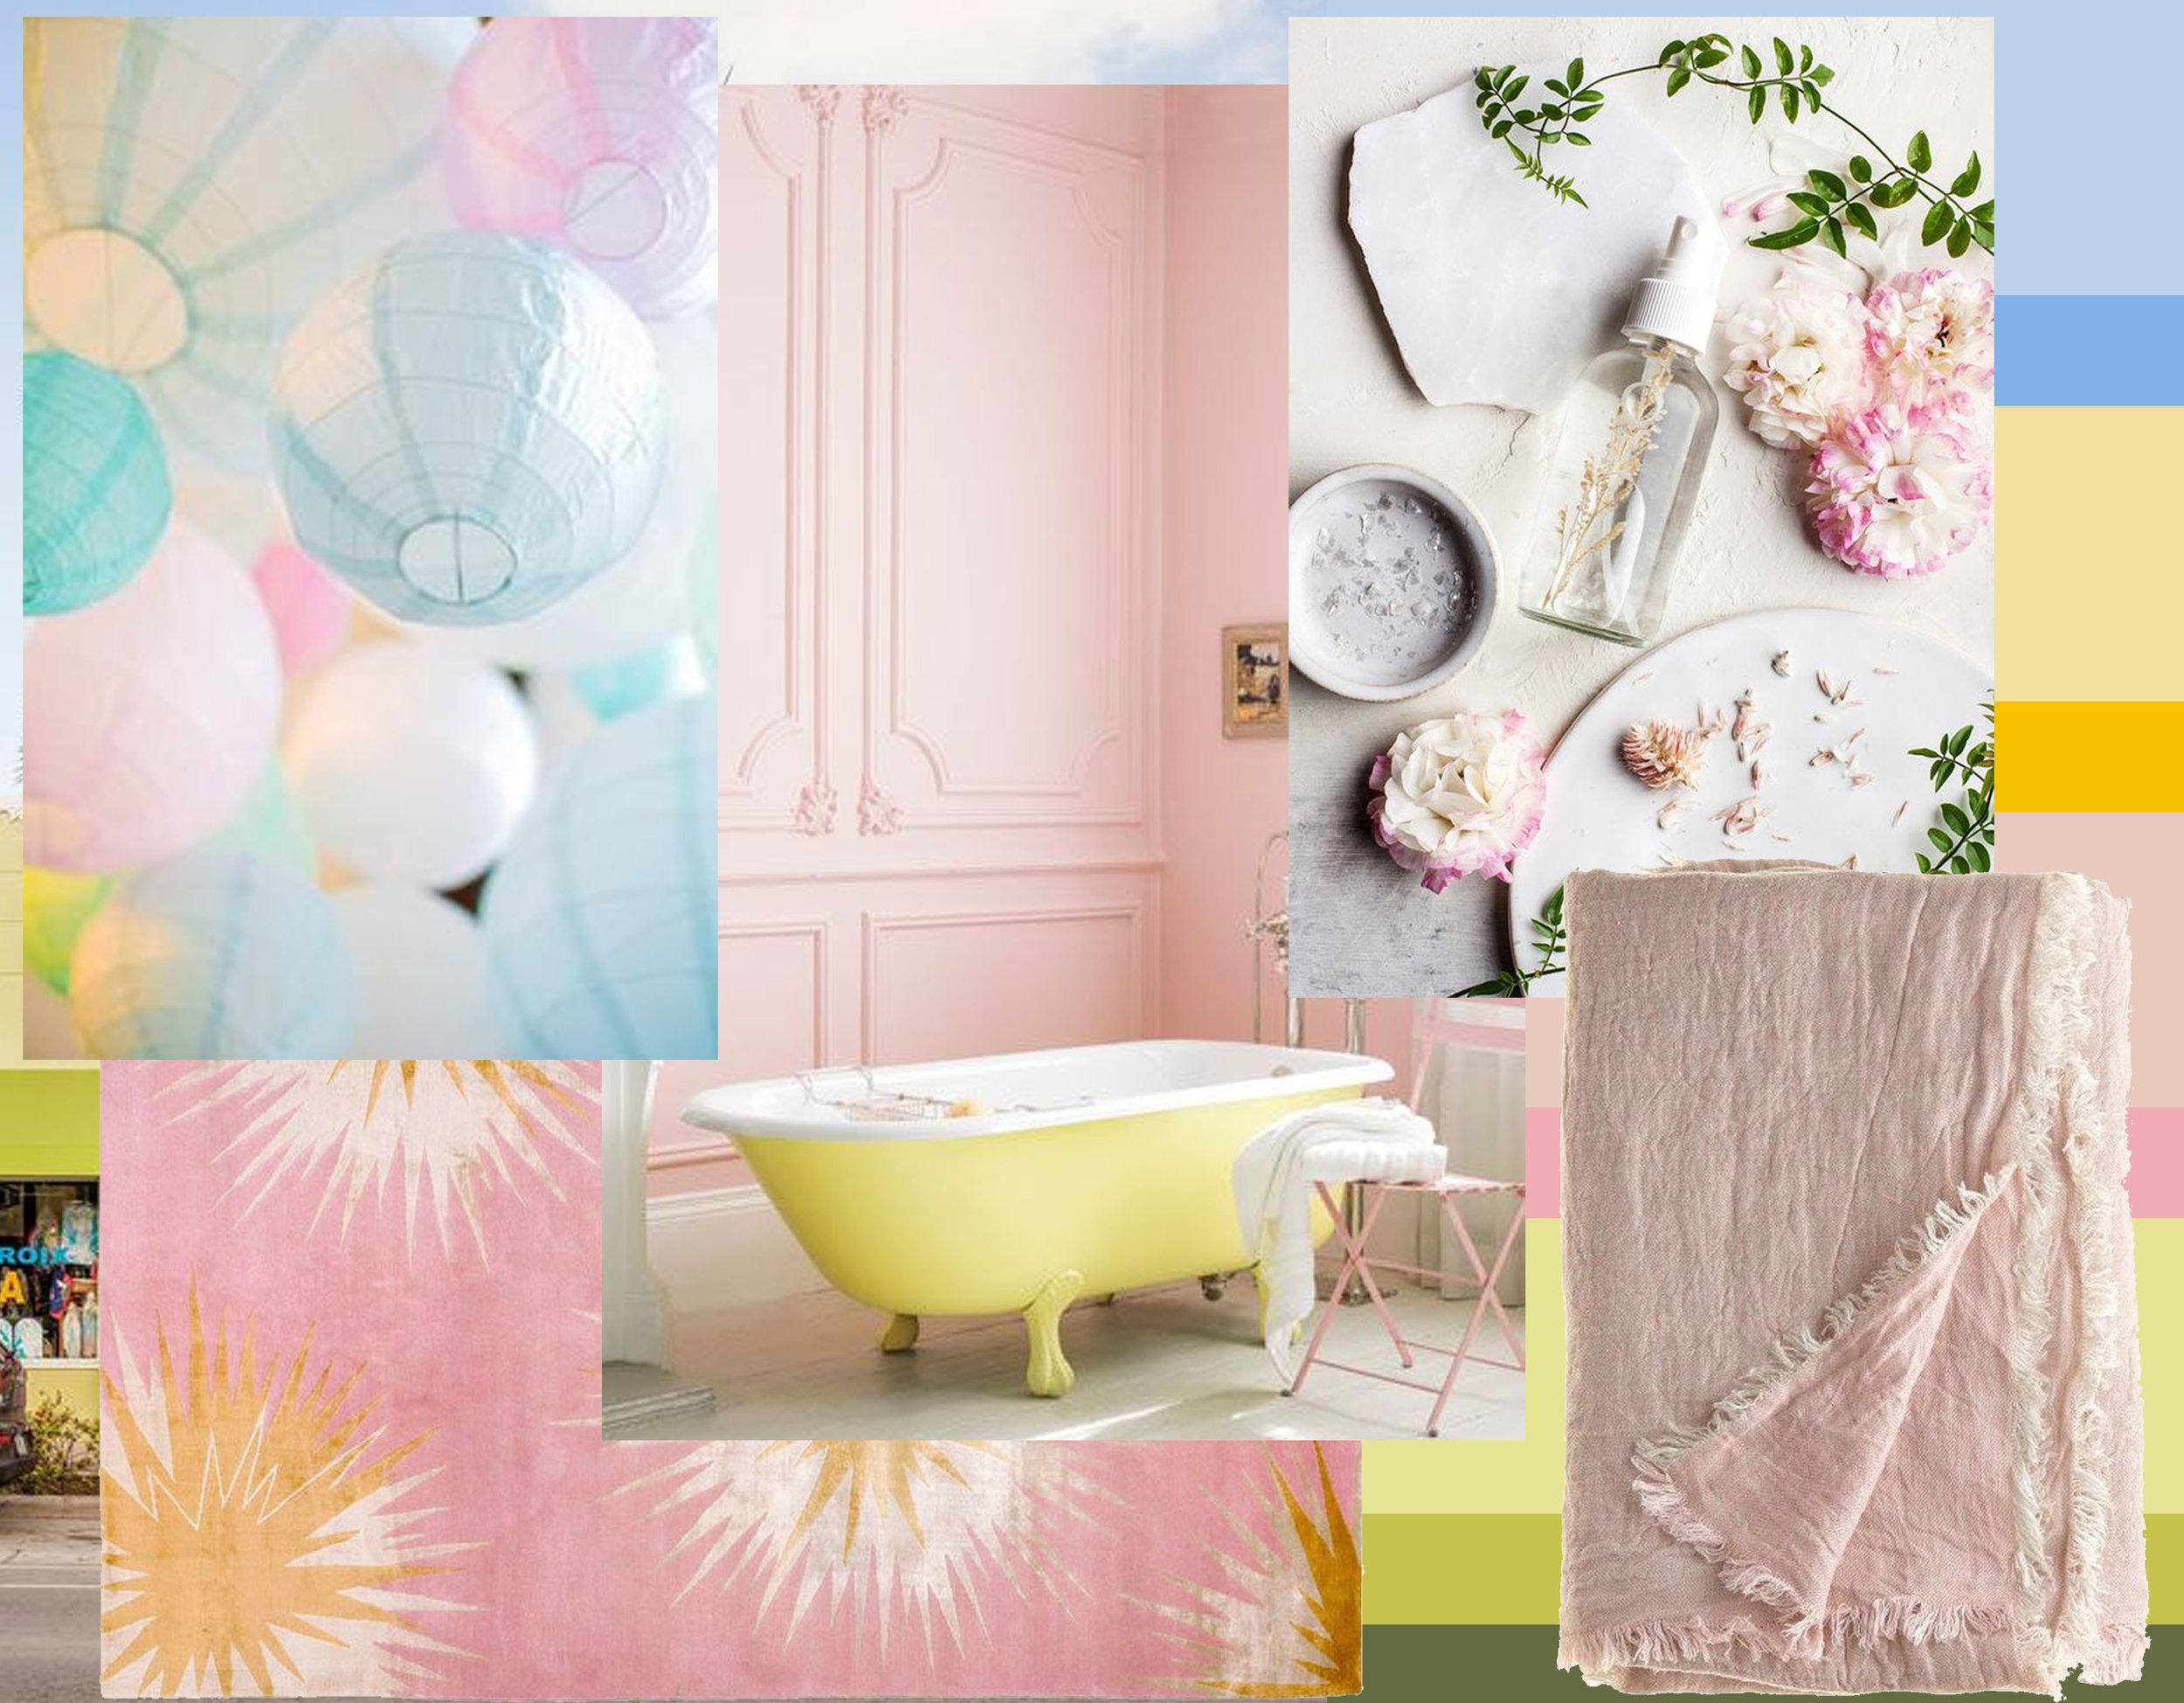 image paper lamps - image bathtub via  Pinterest  - rug Thistle Gold  The Rugcompany  - linen throw via  Pinterest  - beauty image via  Hello Glow